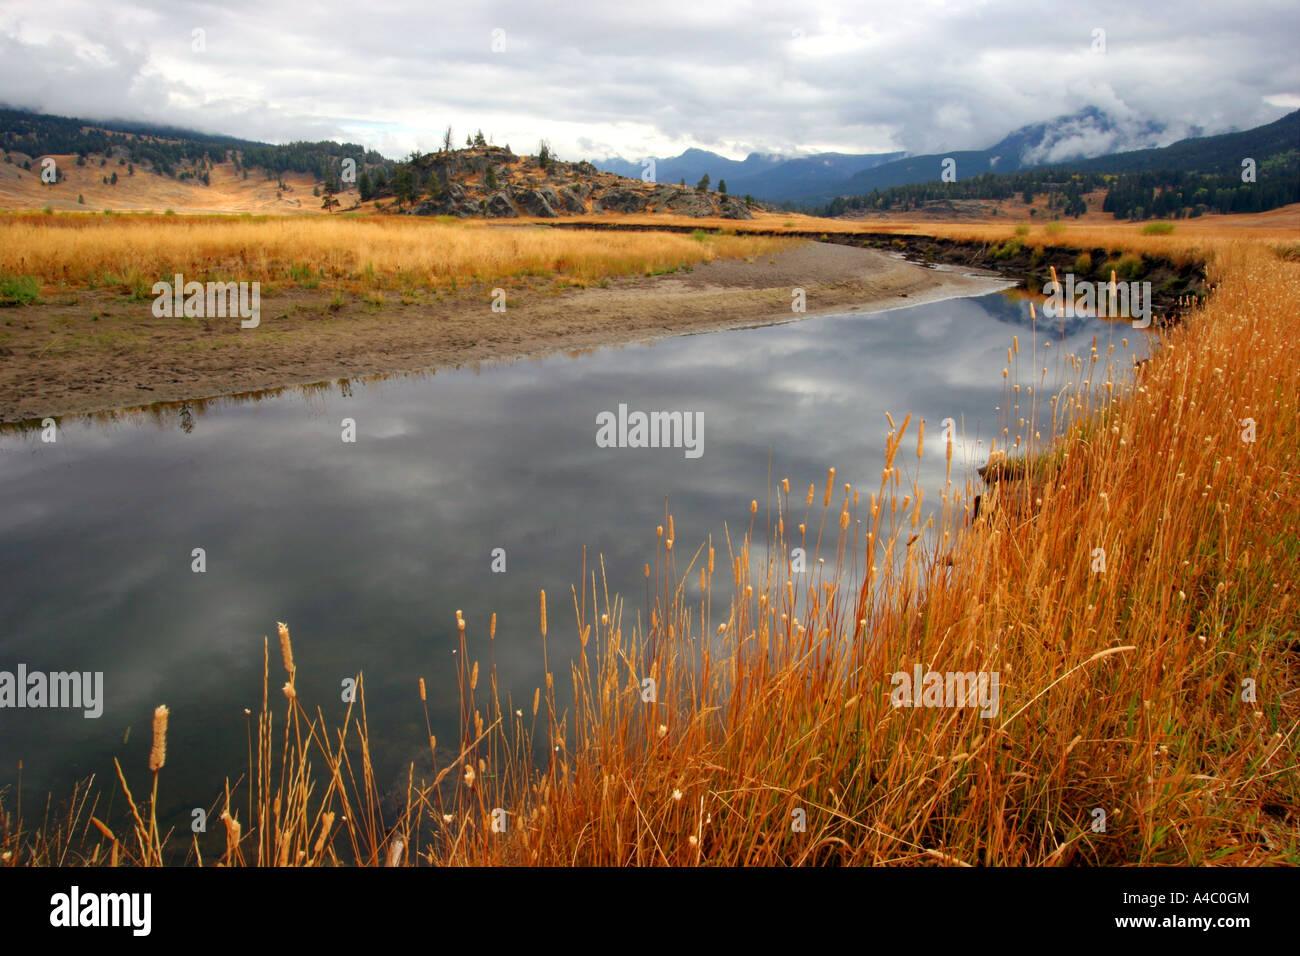 Slough Creek, il parco nazionale di Yellowstone, wyoming Foto Stock